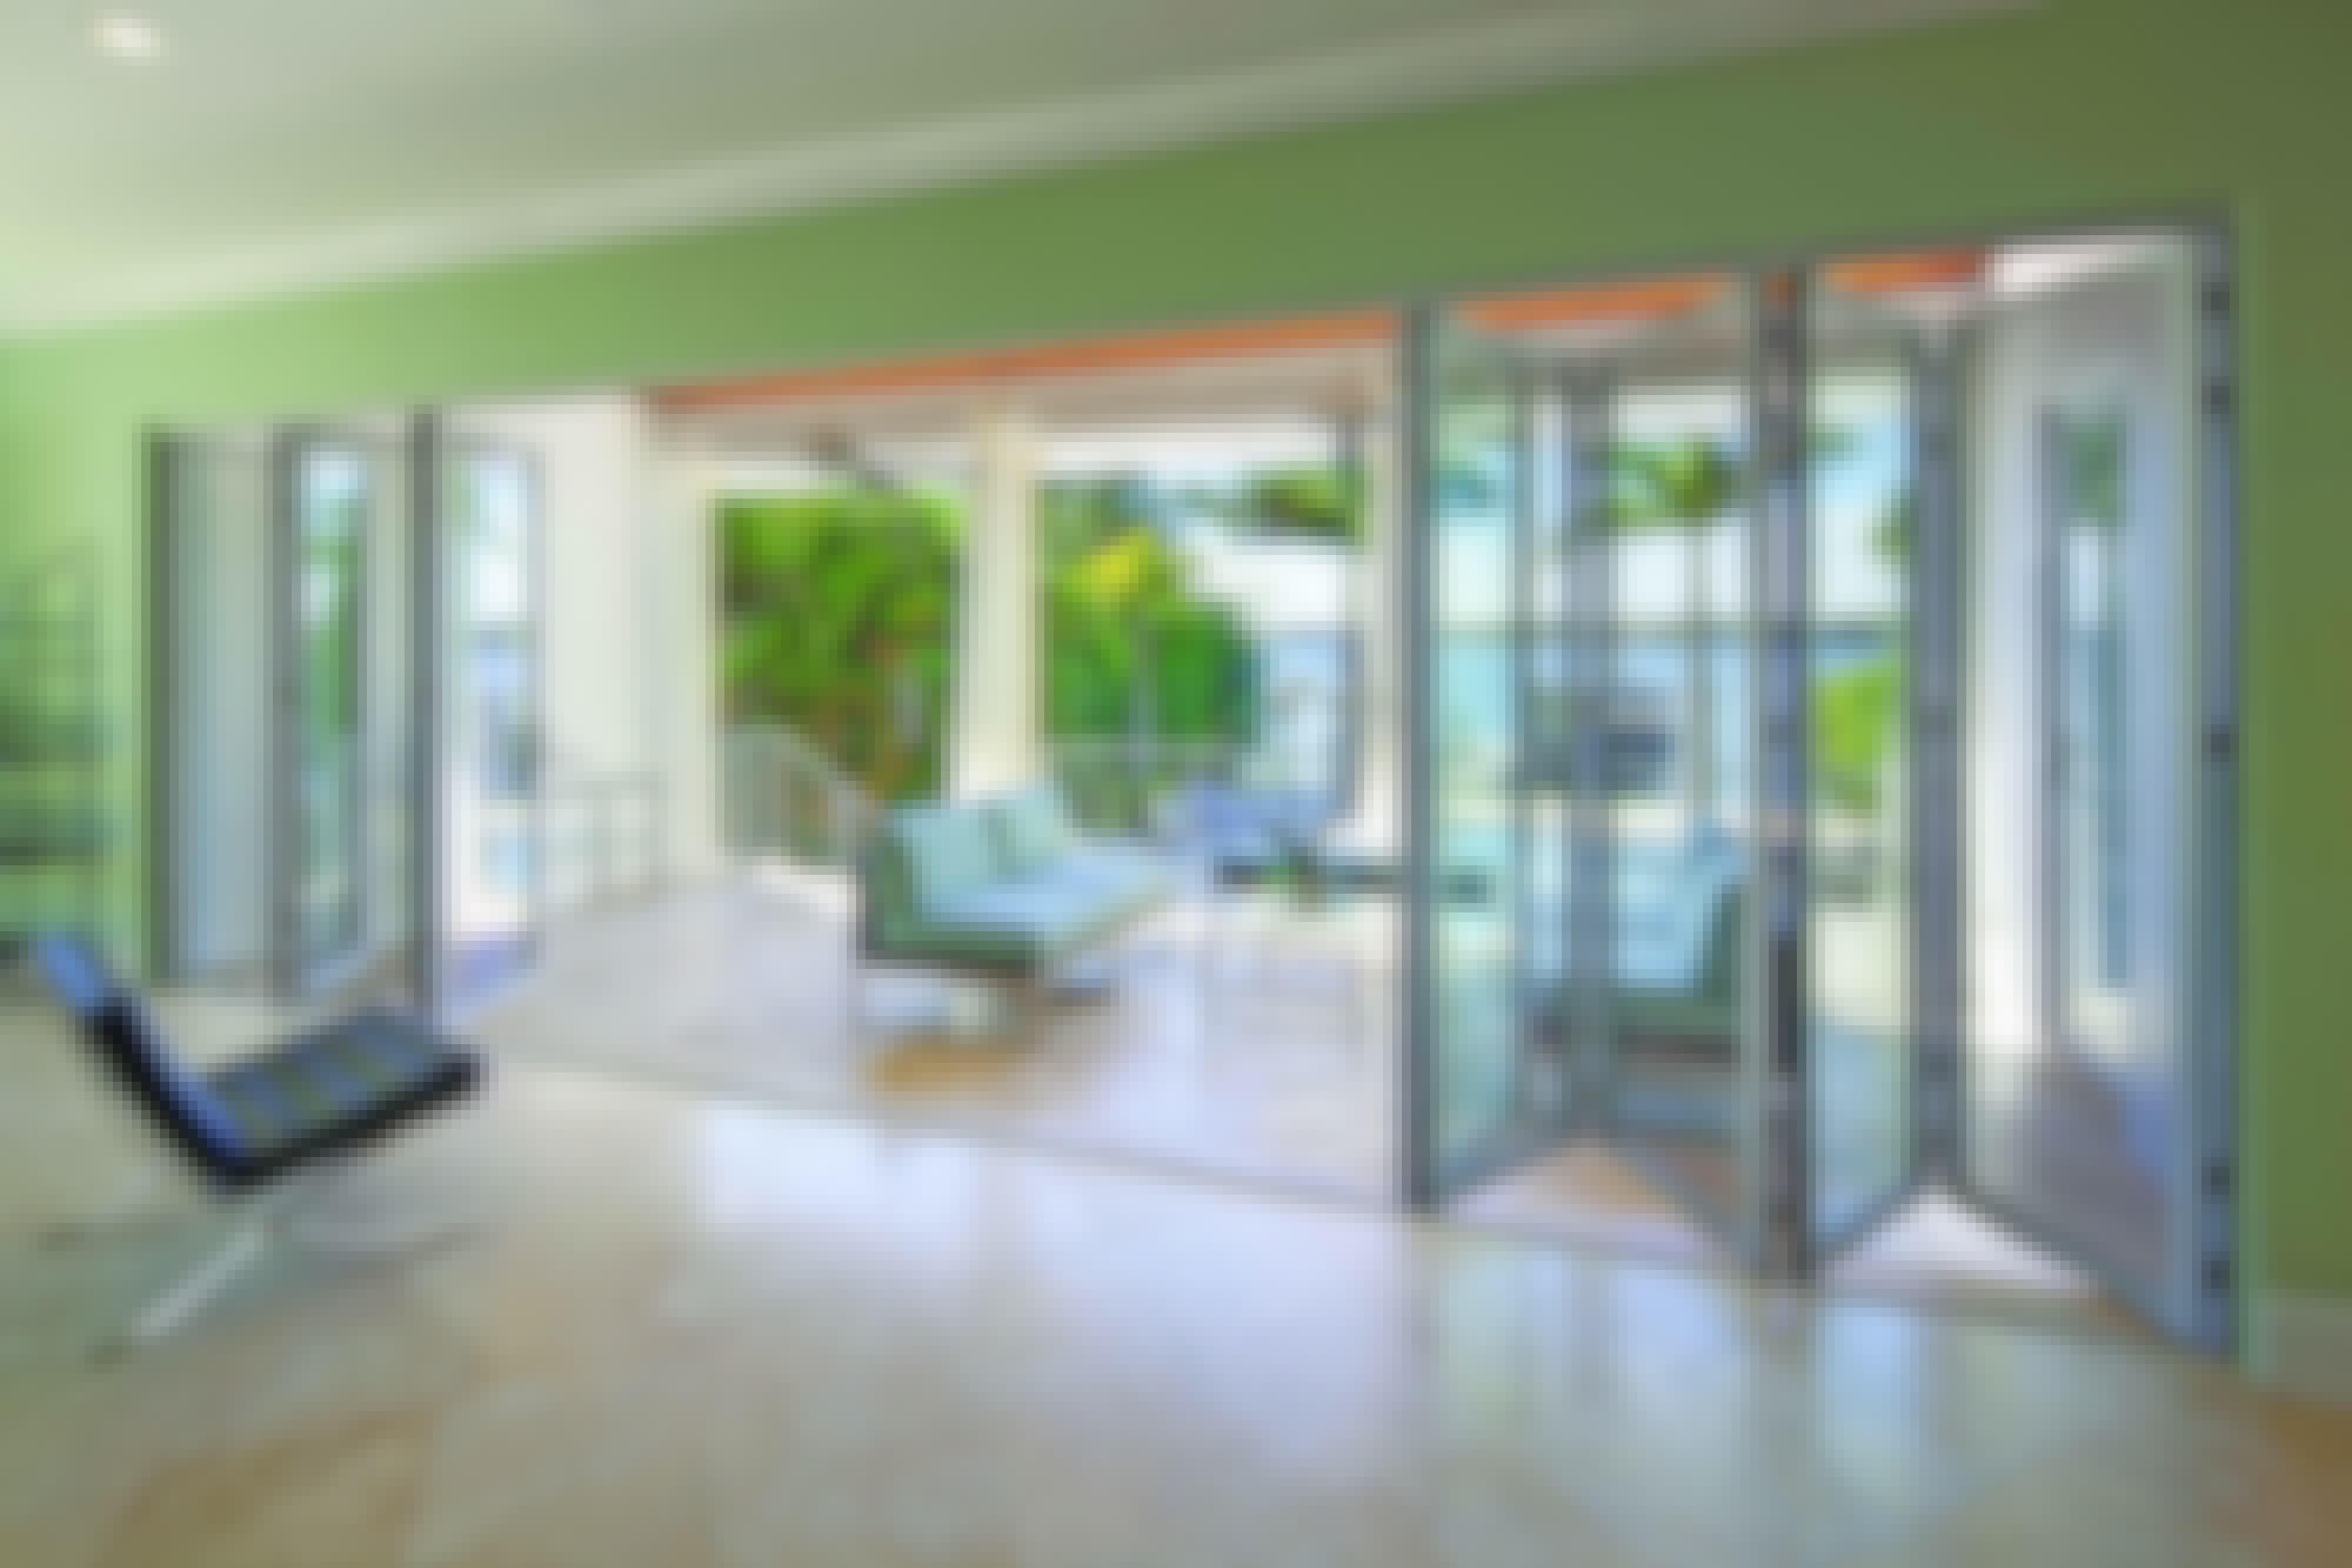 NanaWall SL45 narrow aluminum framed folding glass wall